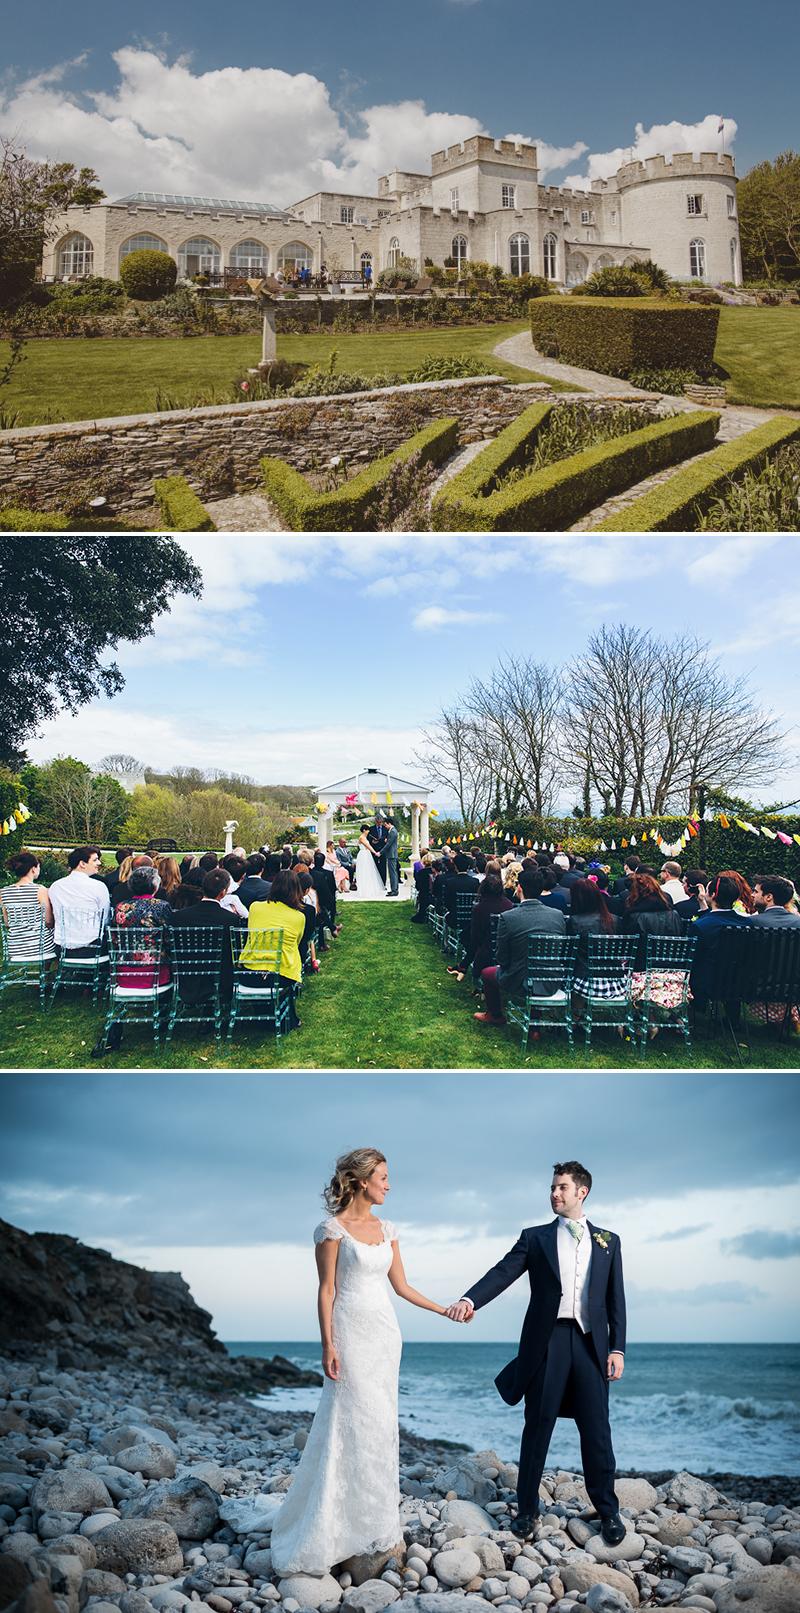 dorset-wedding-venue-20-percent-spring-offer-the-penn-coco-wedding-venues-layer-2